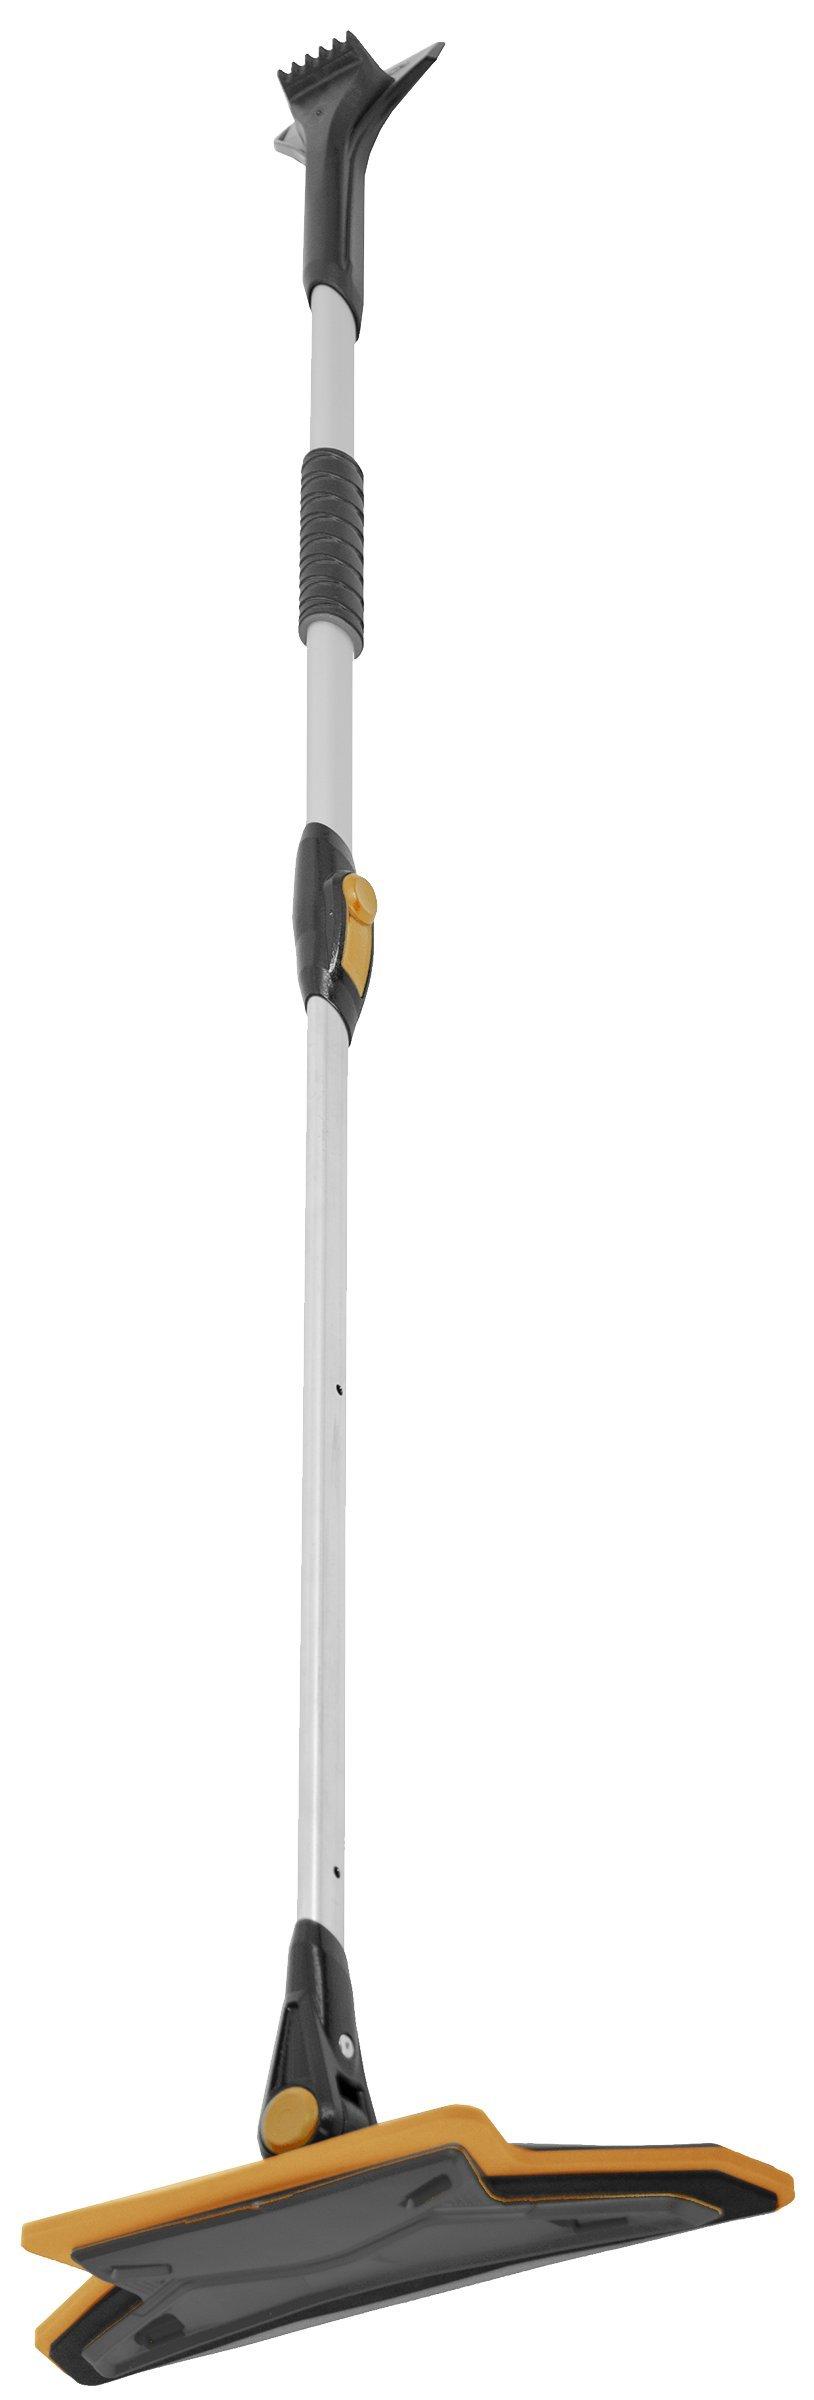 The Ames Companies, Inc ABTT5212 True Temper Telescoping Scratch-Free Snow Brush, 52-Inch